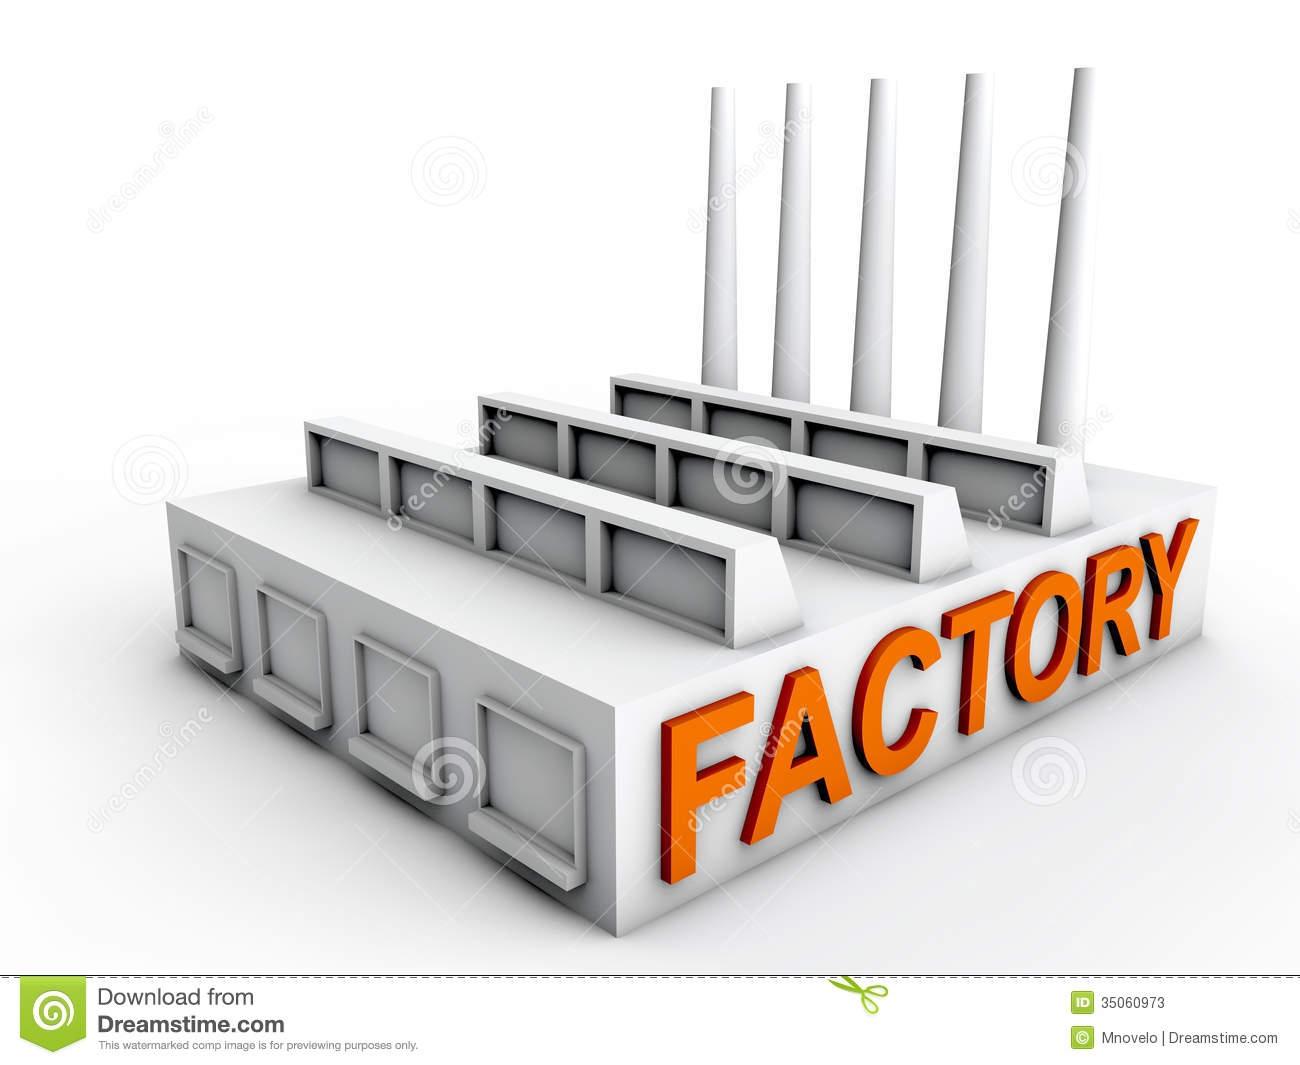 Factory clipart factory building Clipart#2130902 Plant building clipart Factory